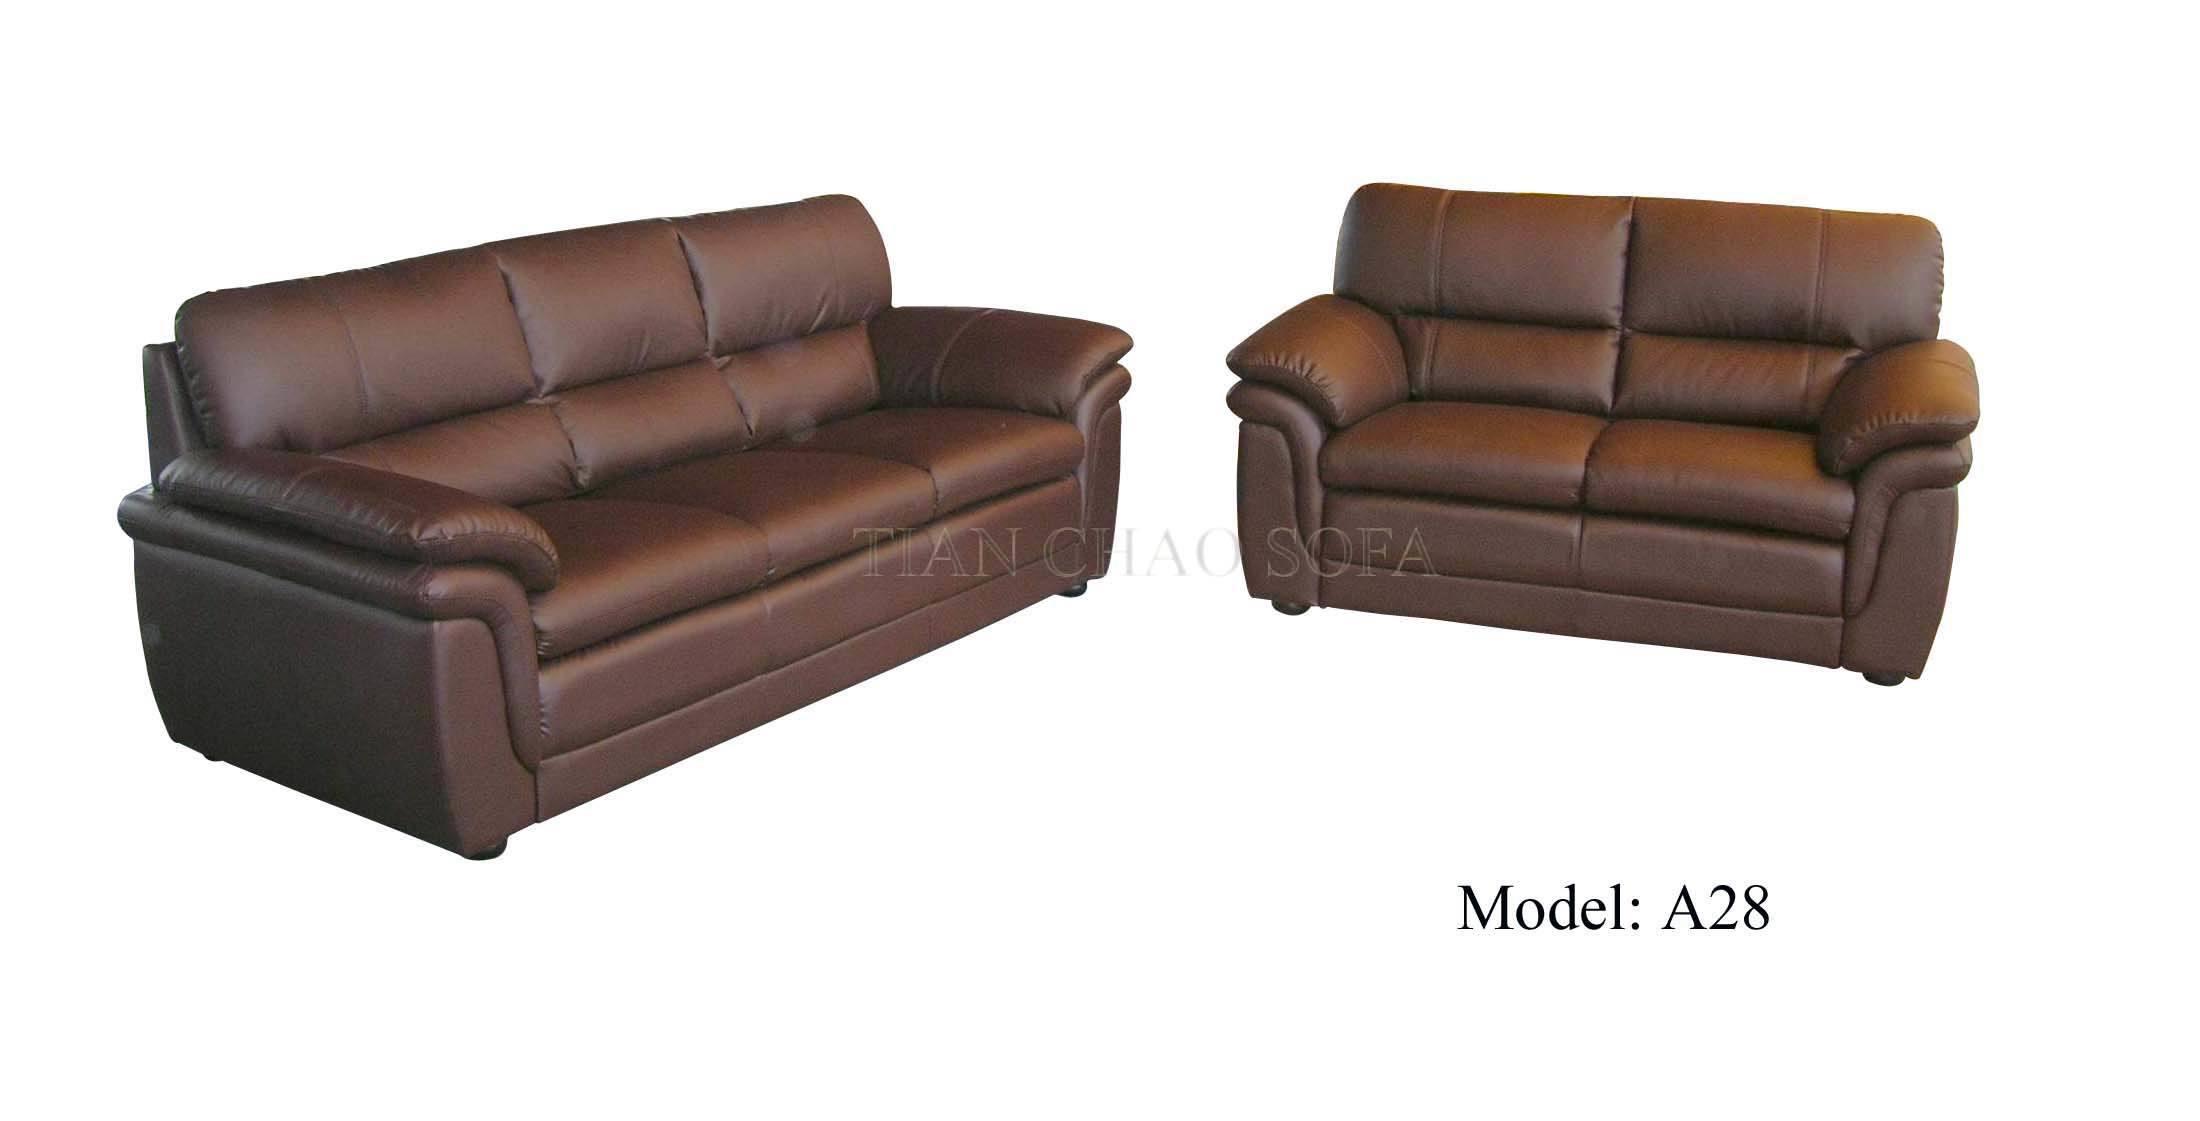 China Leather Sofa (A28) - China sofa, leather sofa